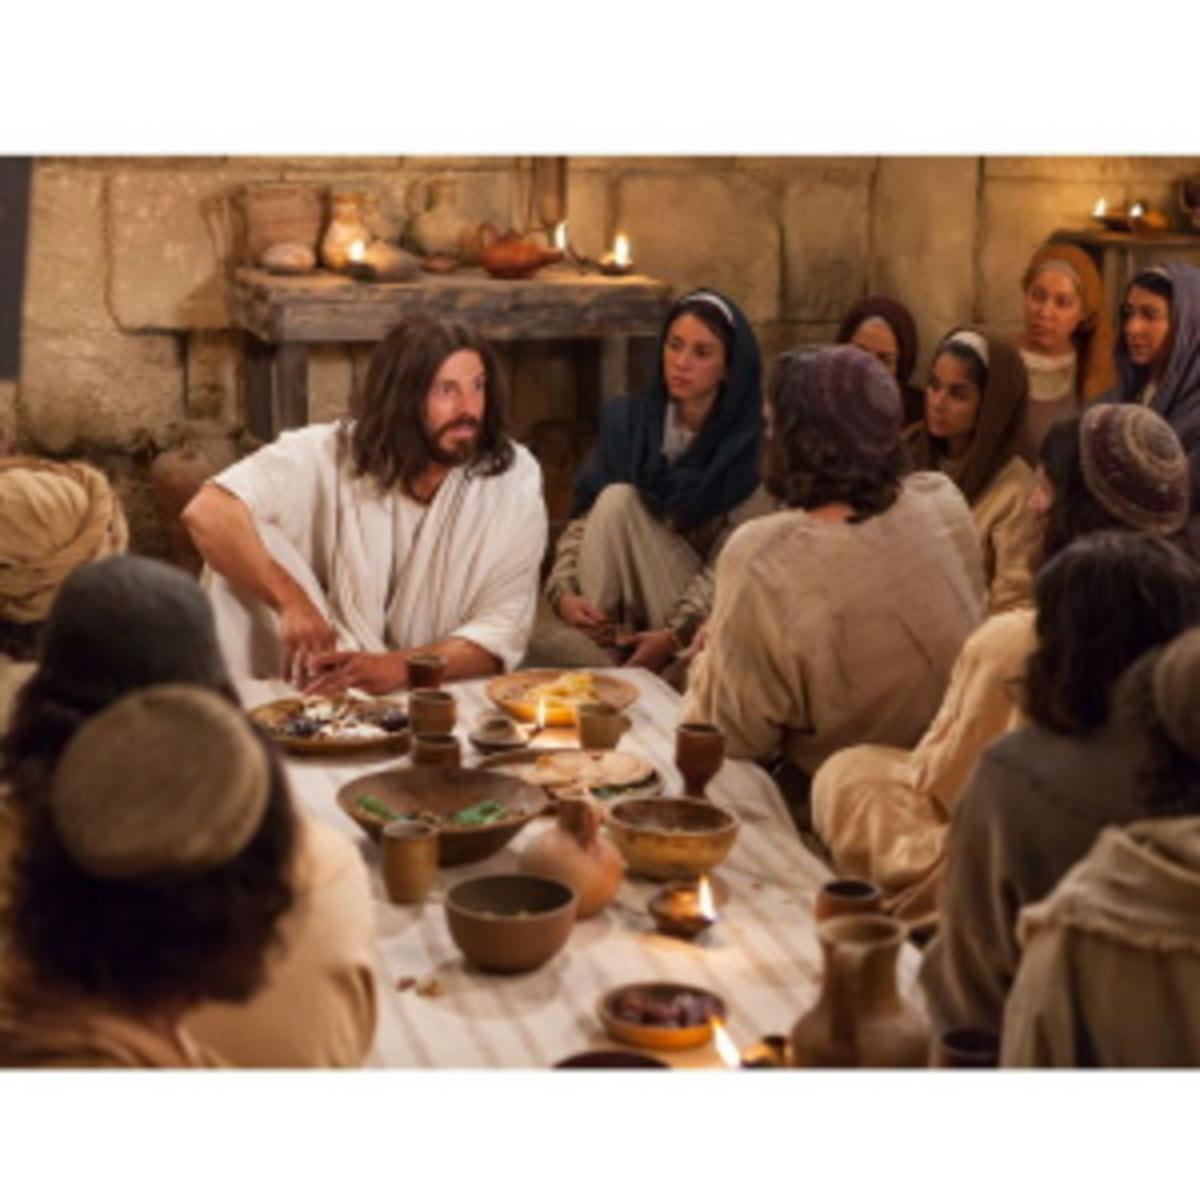 Jesus with His apostles